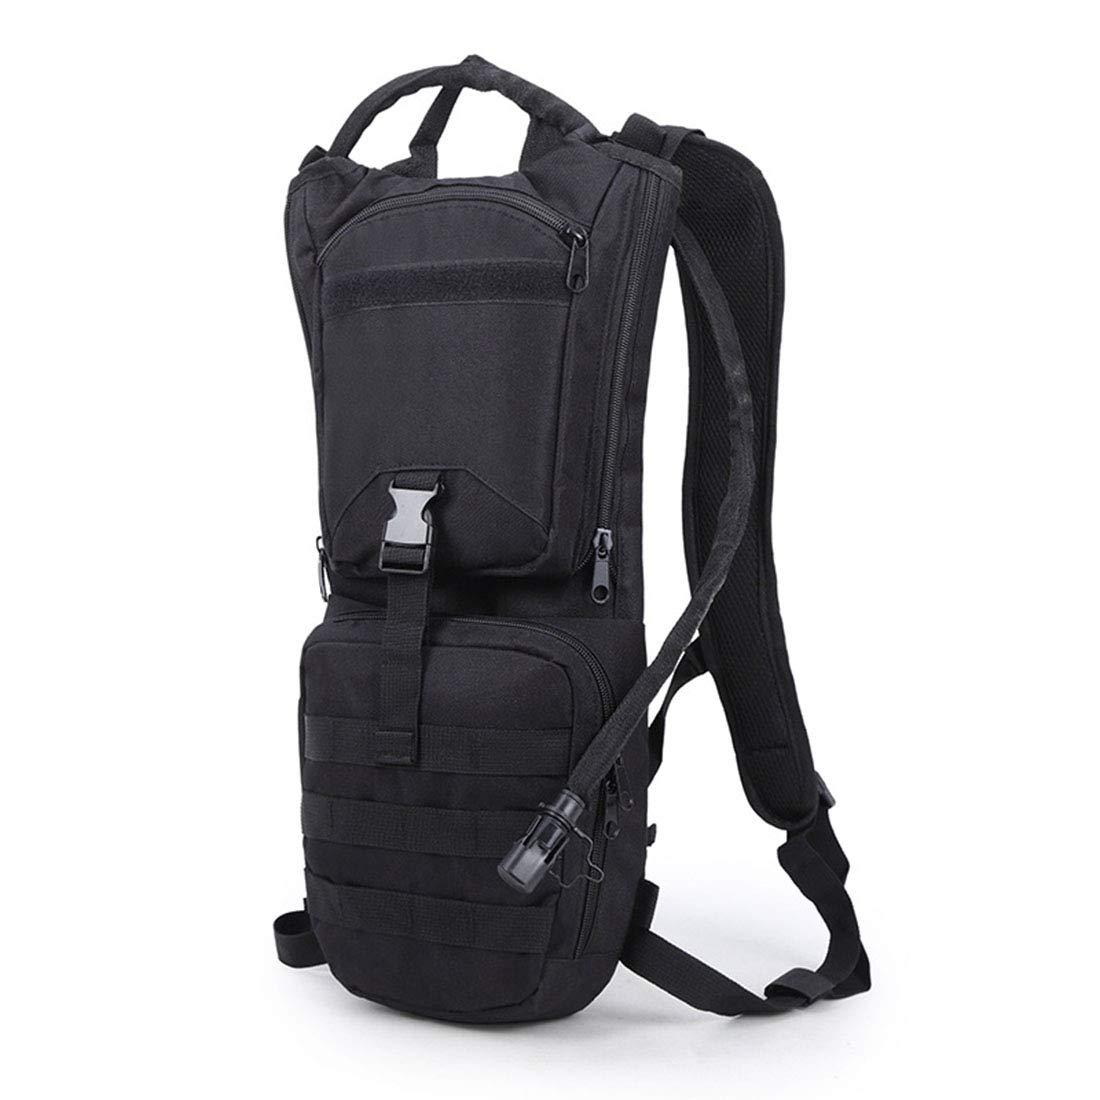 Color : A1 AIYAMAYA Bicycle Riding Bag Water Bag Large Mouth Liner 3L Water Bag Backpack